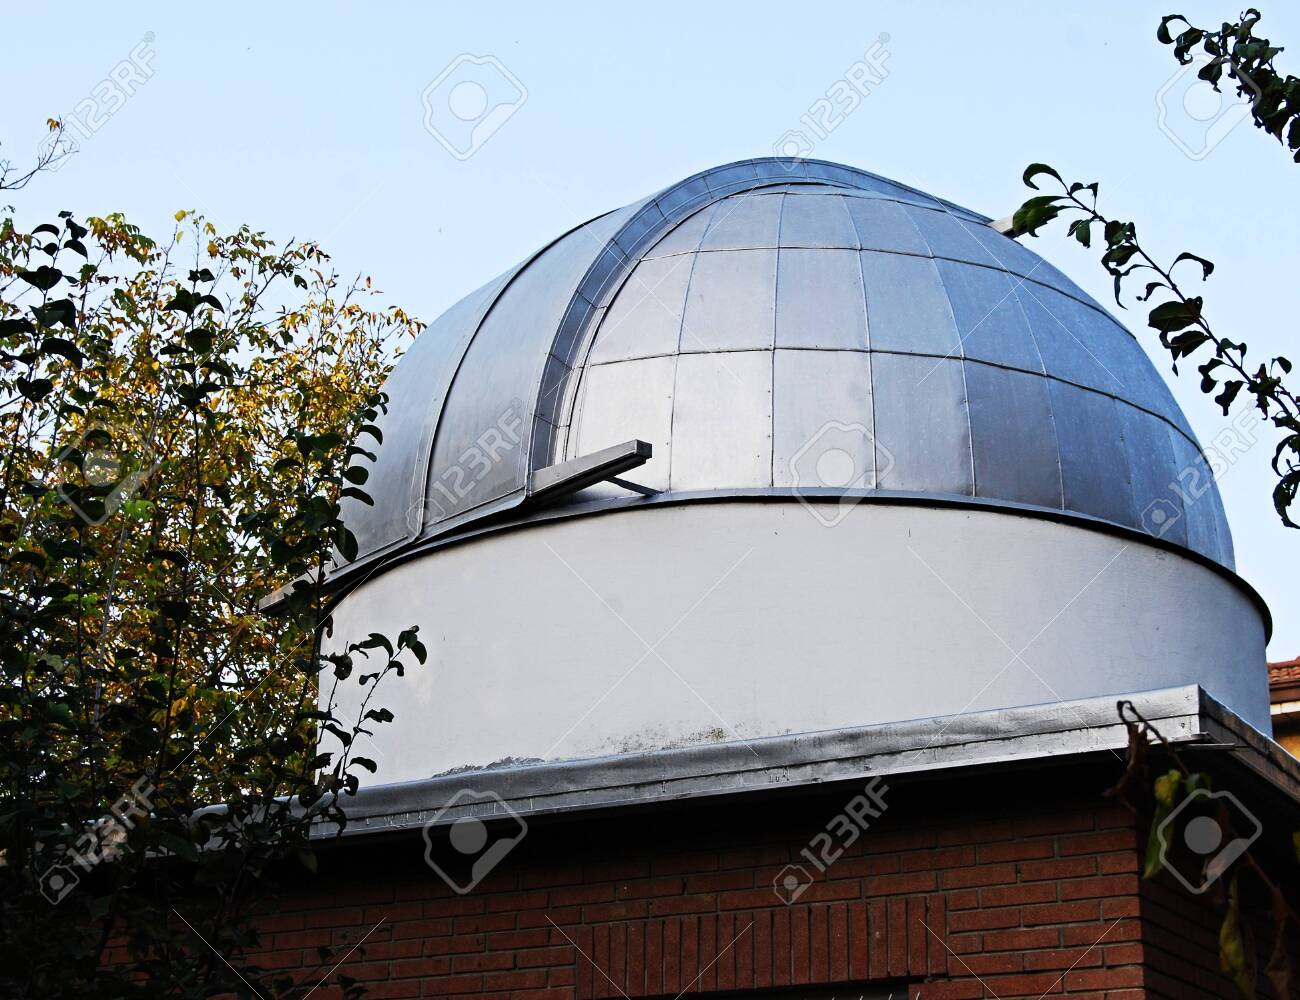 Astronomical homemade dome for telescope - 151984595